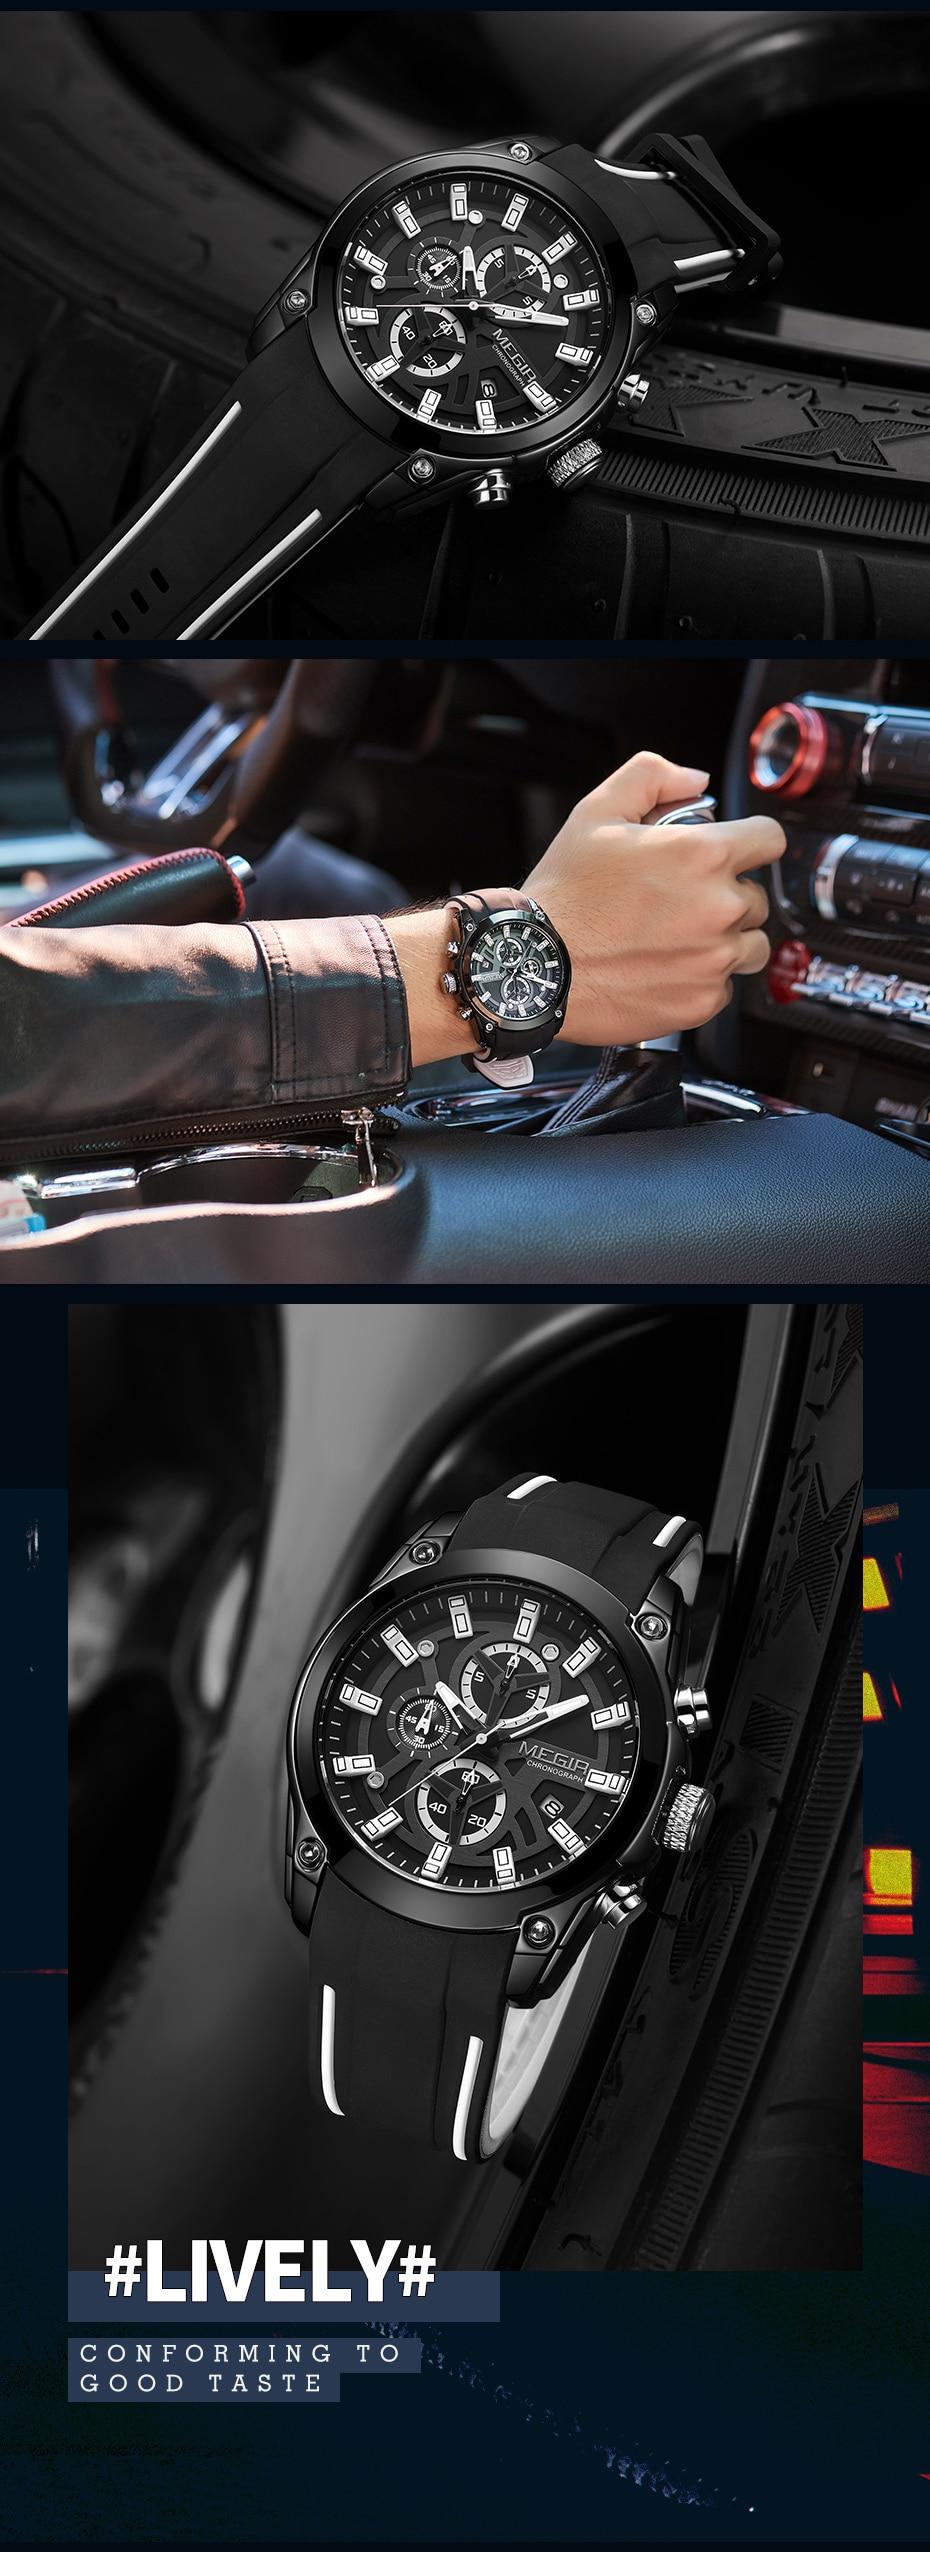 H281755c1295e416884130b63210523f9Q MEGIR 2020 Blue Sport Watches for Men